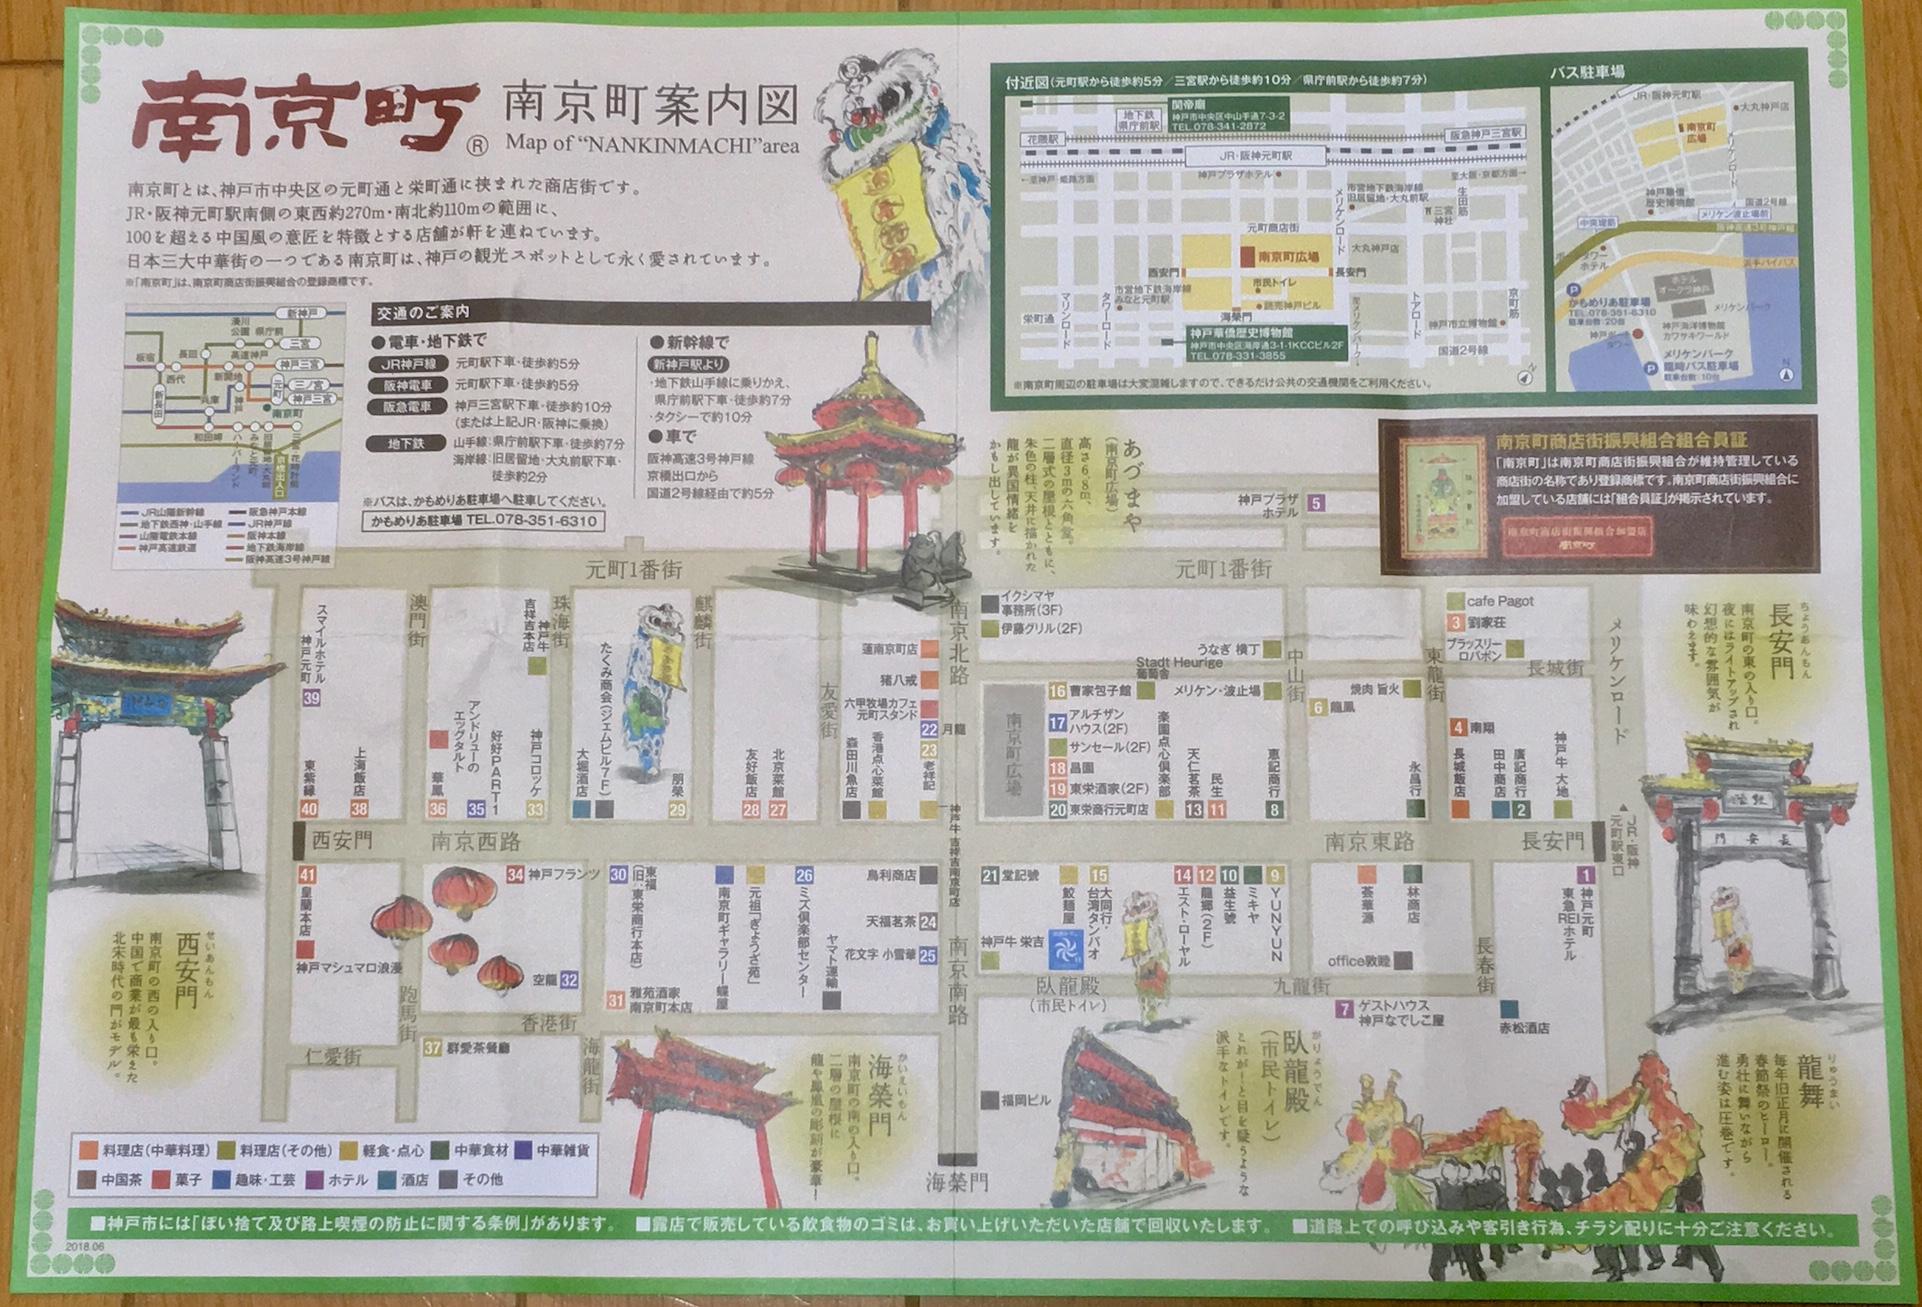 神戸南京町の案内図